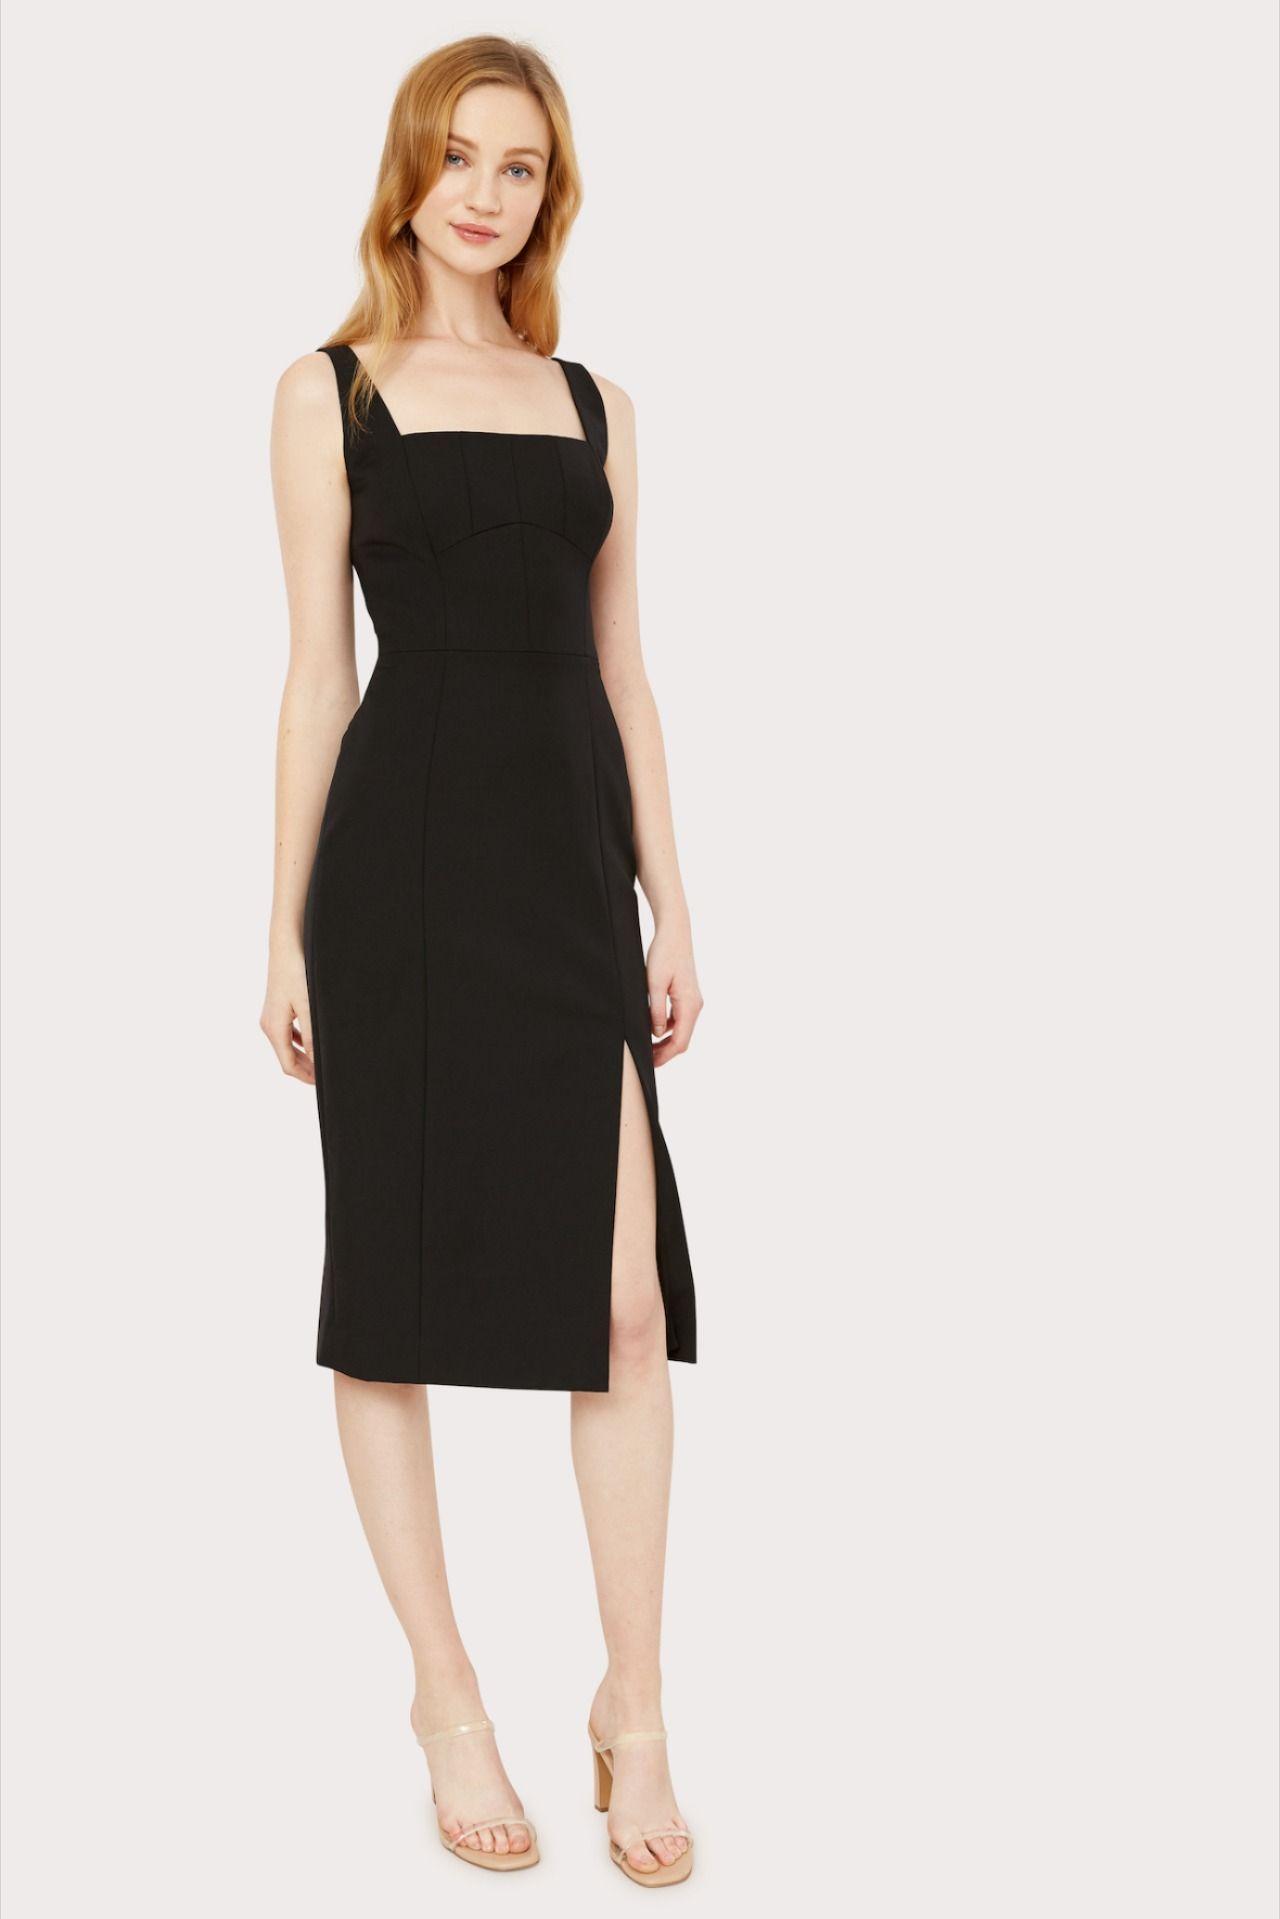 Rita Square Neck Midi Dress Cute Skirt Outfits Midi Dress Sleeveless Midi Dress [ 1919 x 1280 Pixel ]